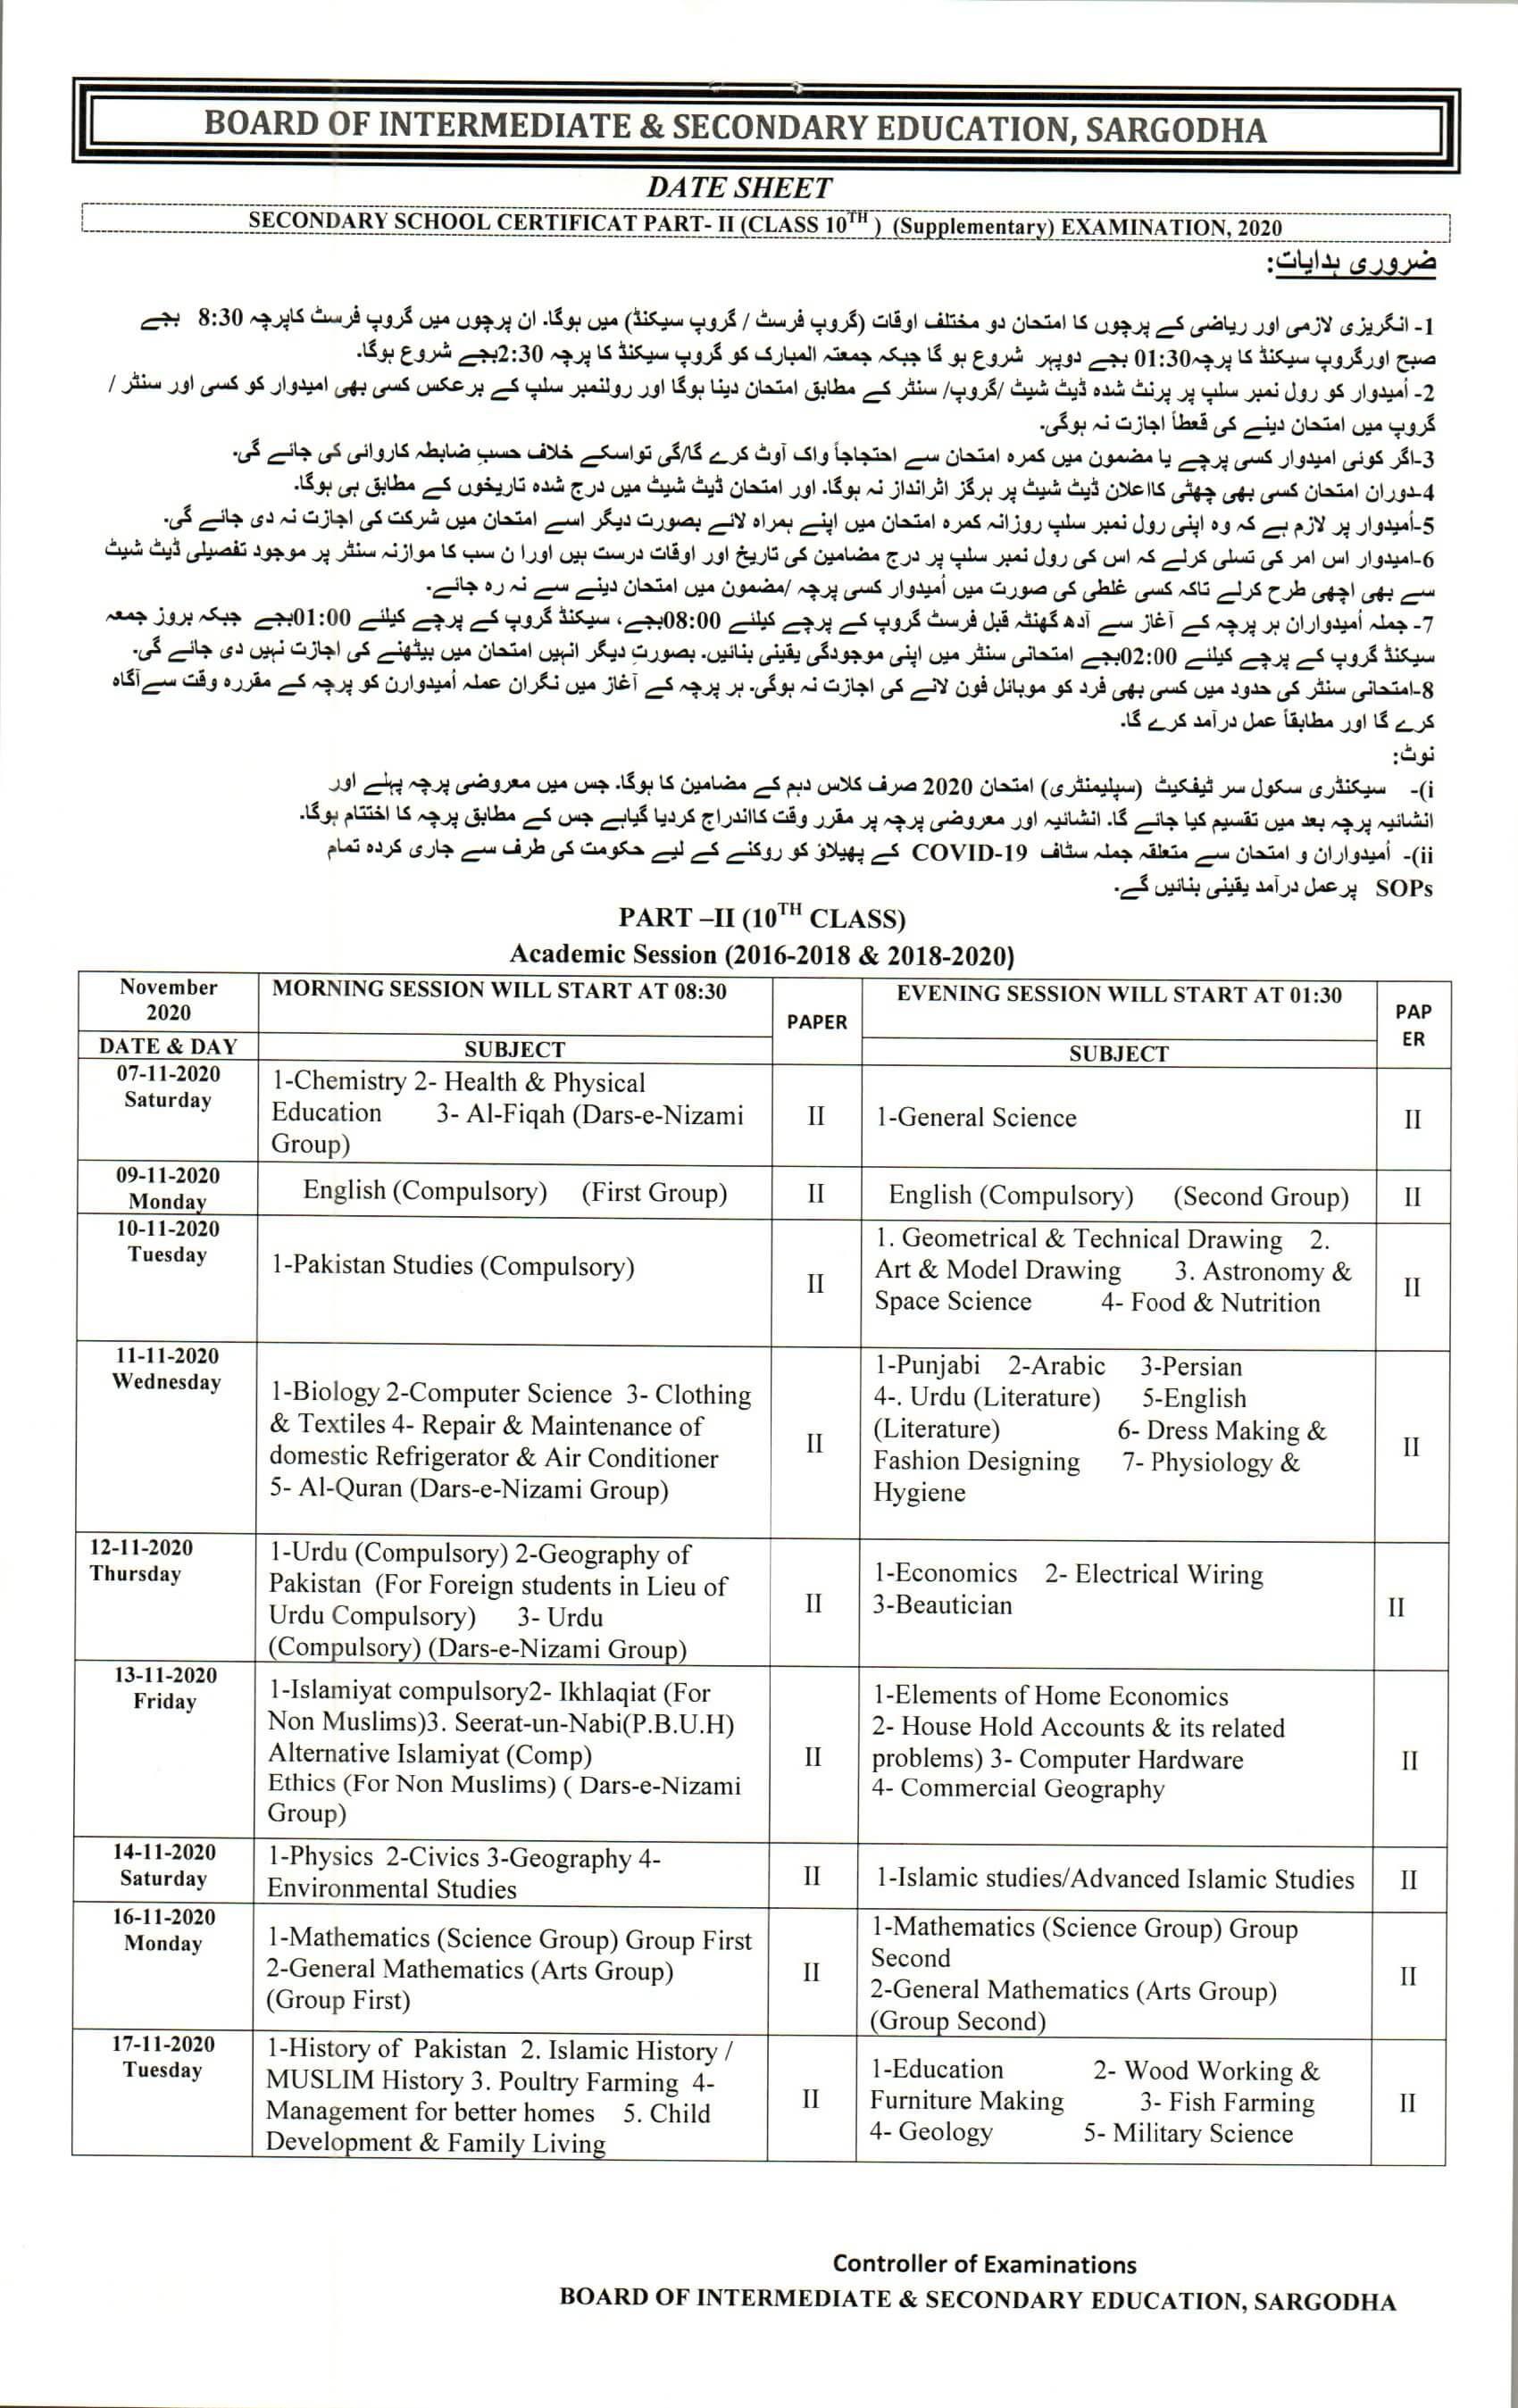 BISE Sargodha matric Date Sheet Supplementary 2020